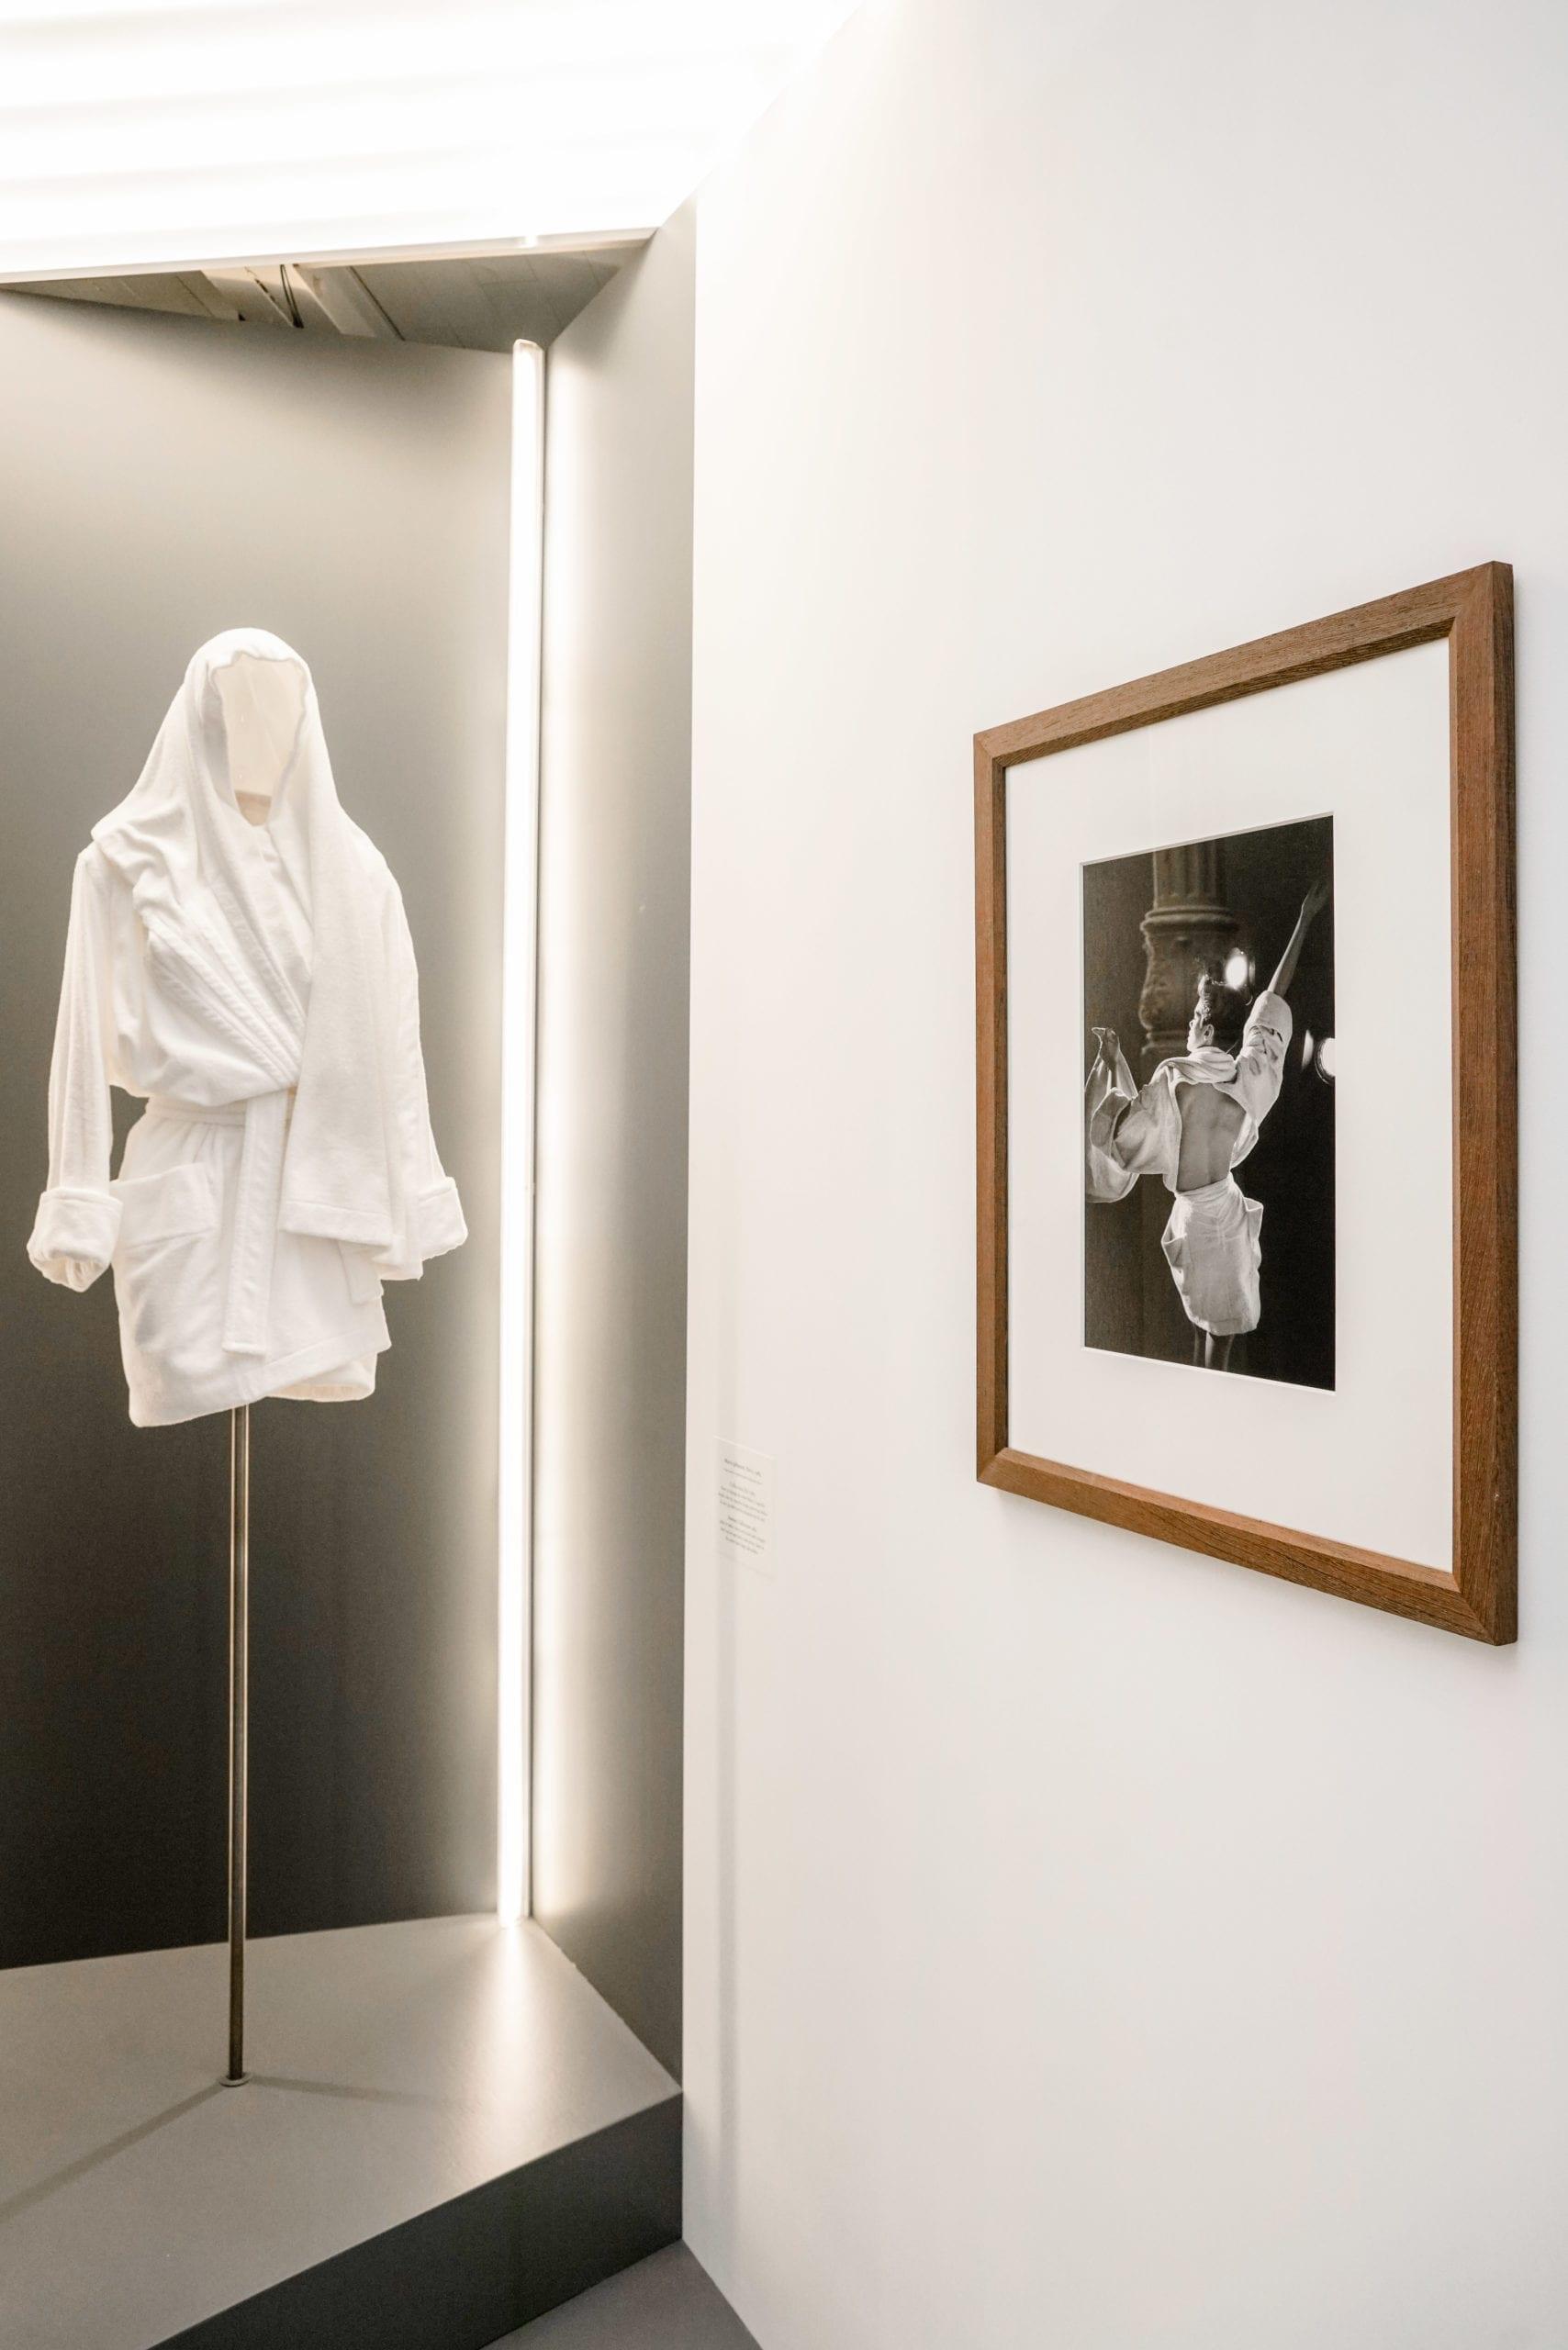 Exposition Peter Lindbergh x Azzedine Alaïa à la Fondation Azzedine Alaïa